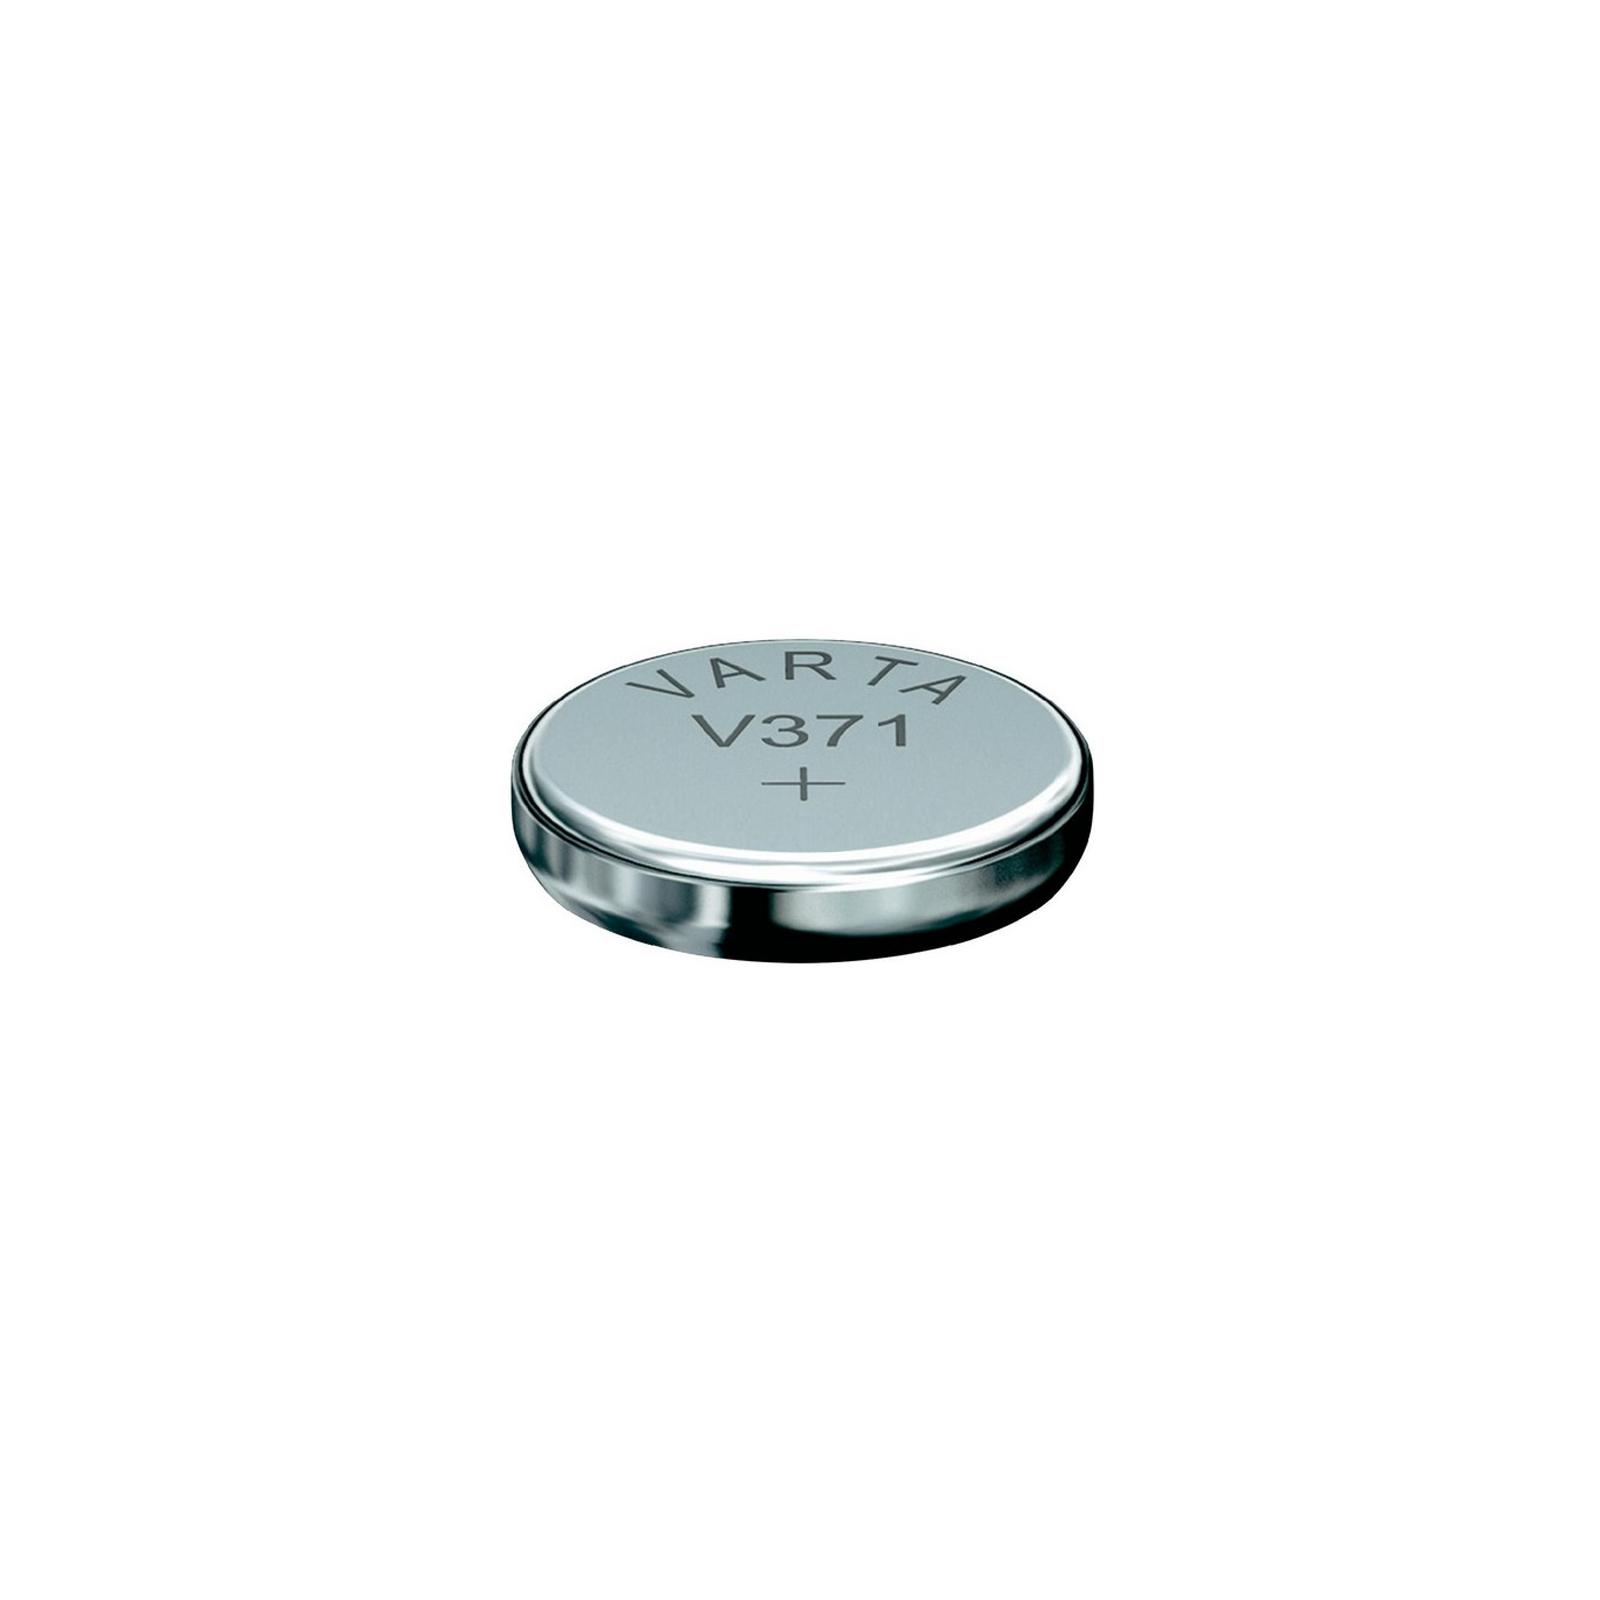 Батарейка Varta V 371 WATCH (00371101111)